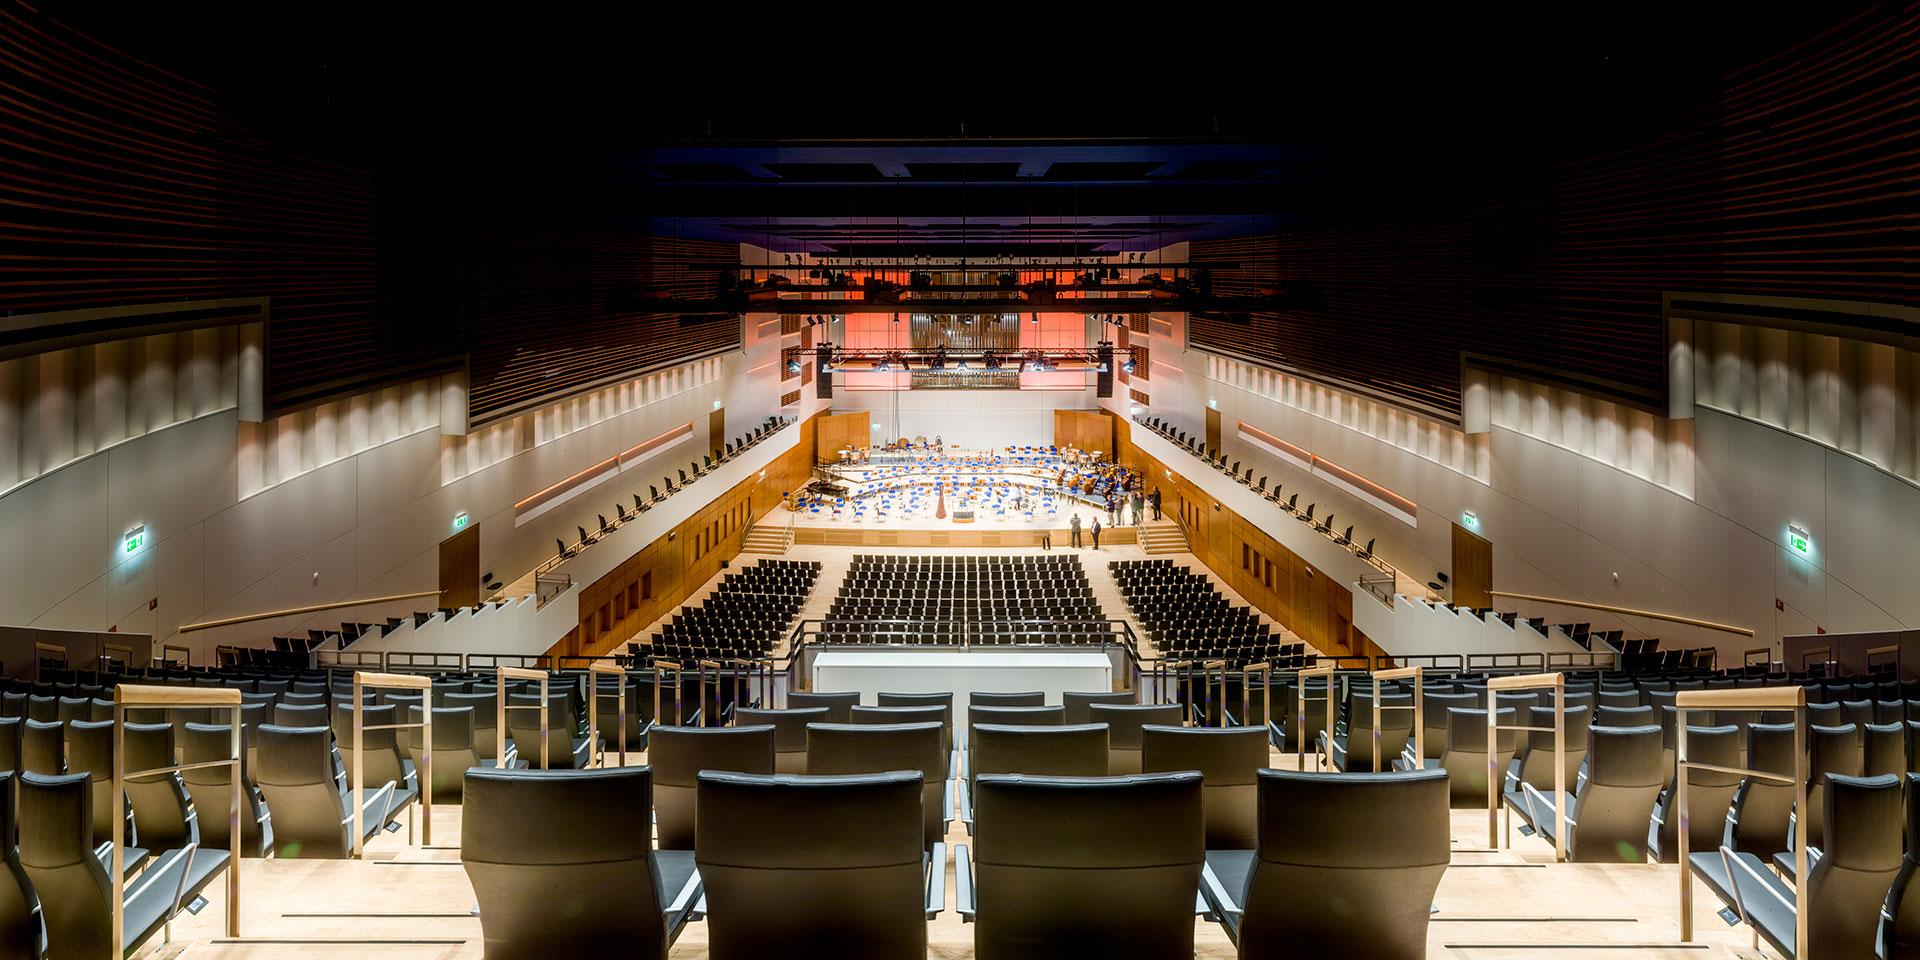 Mercatorhalle - Duisburg